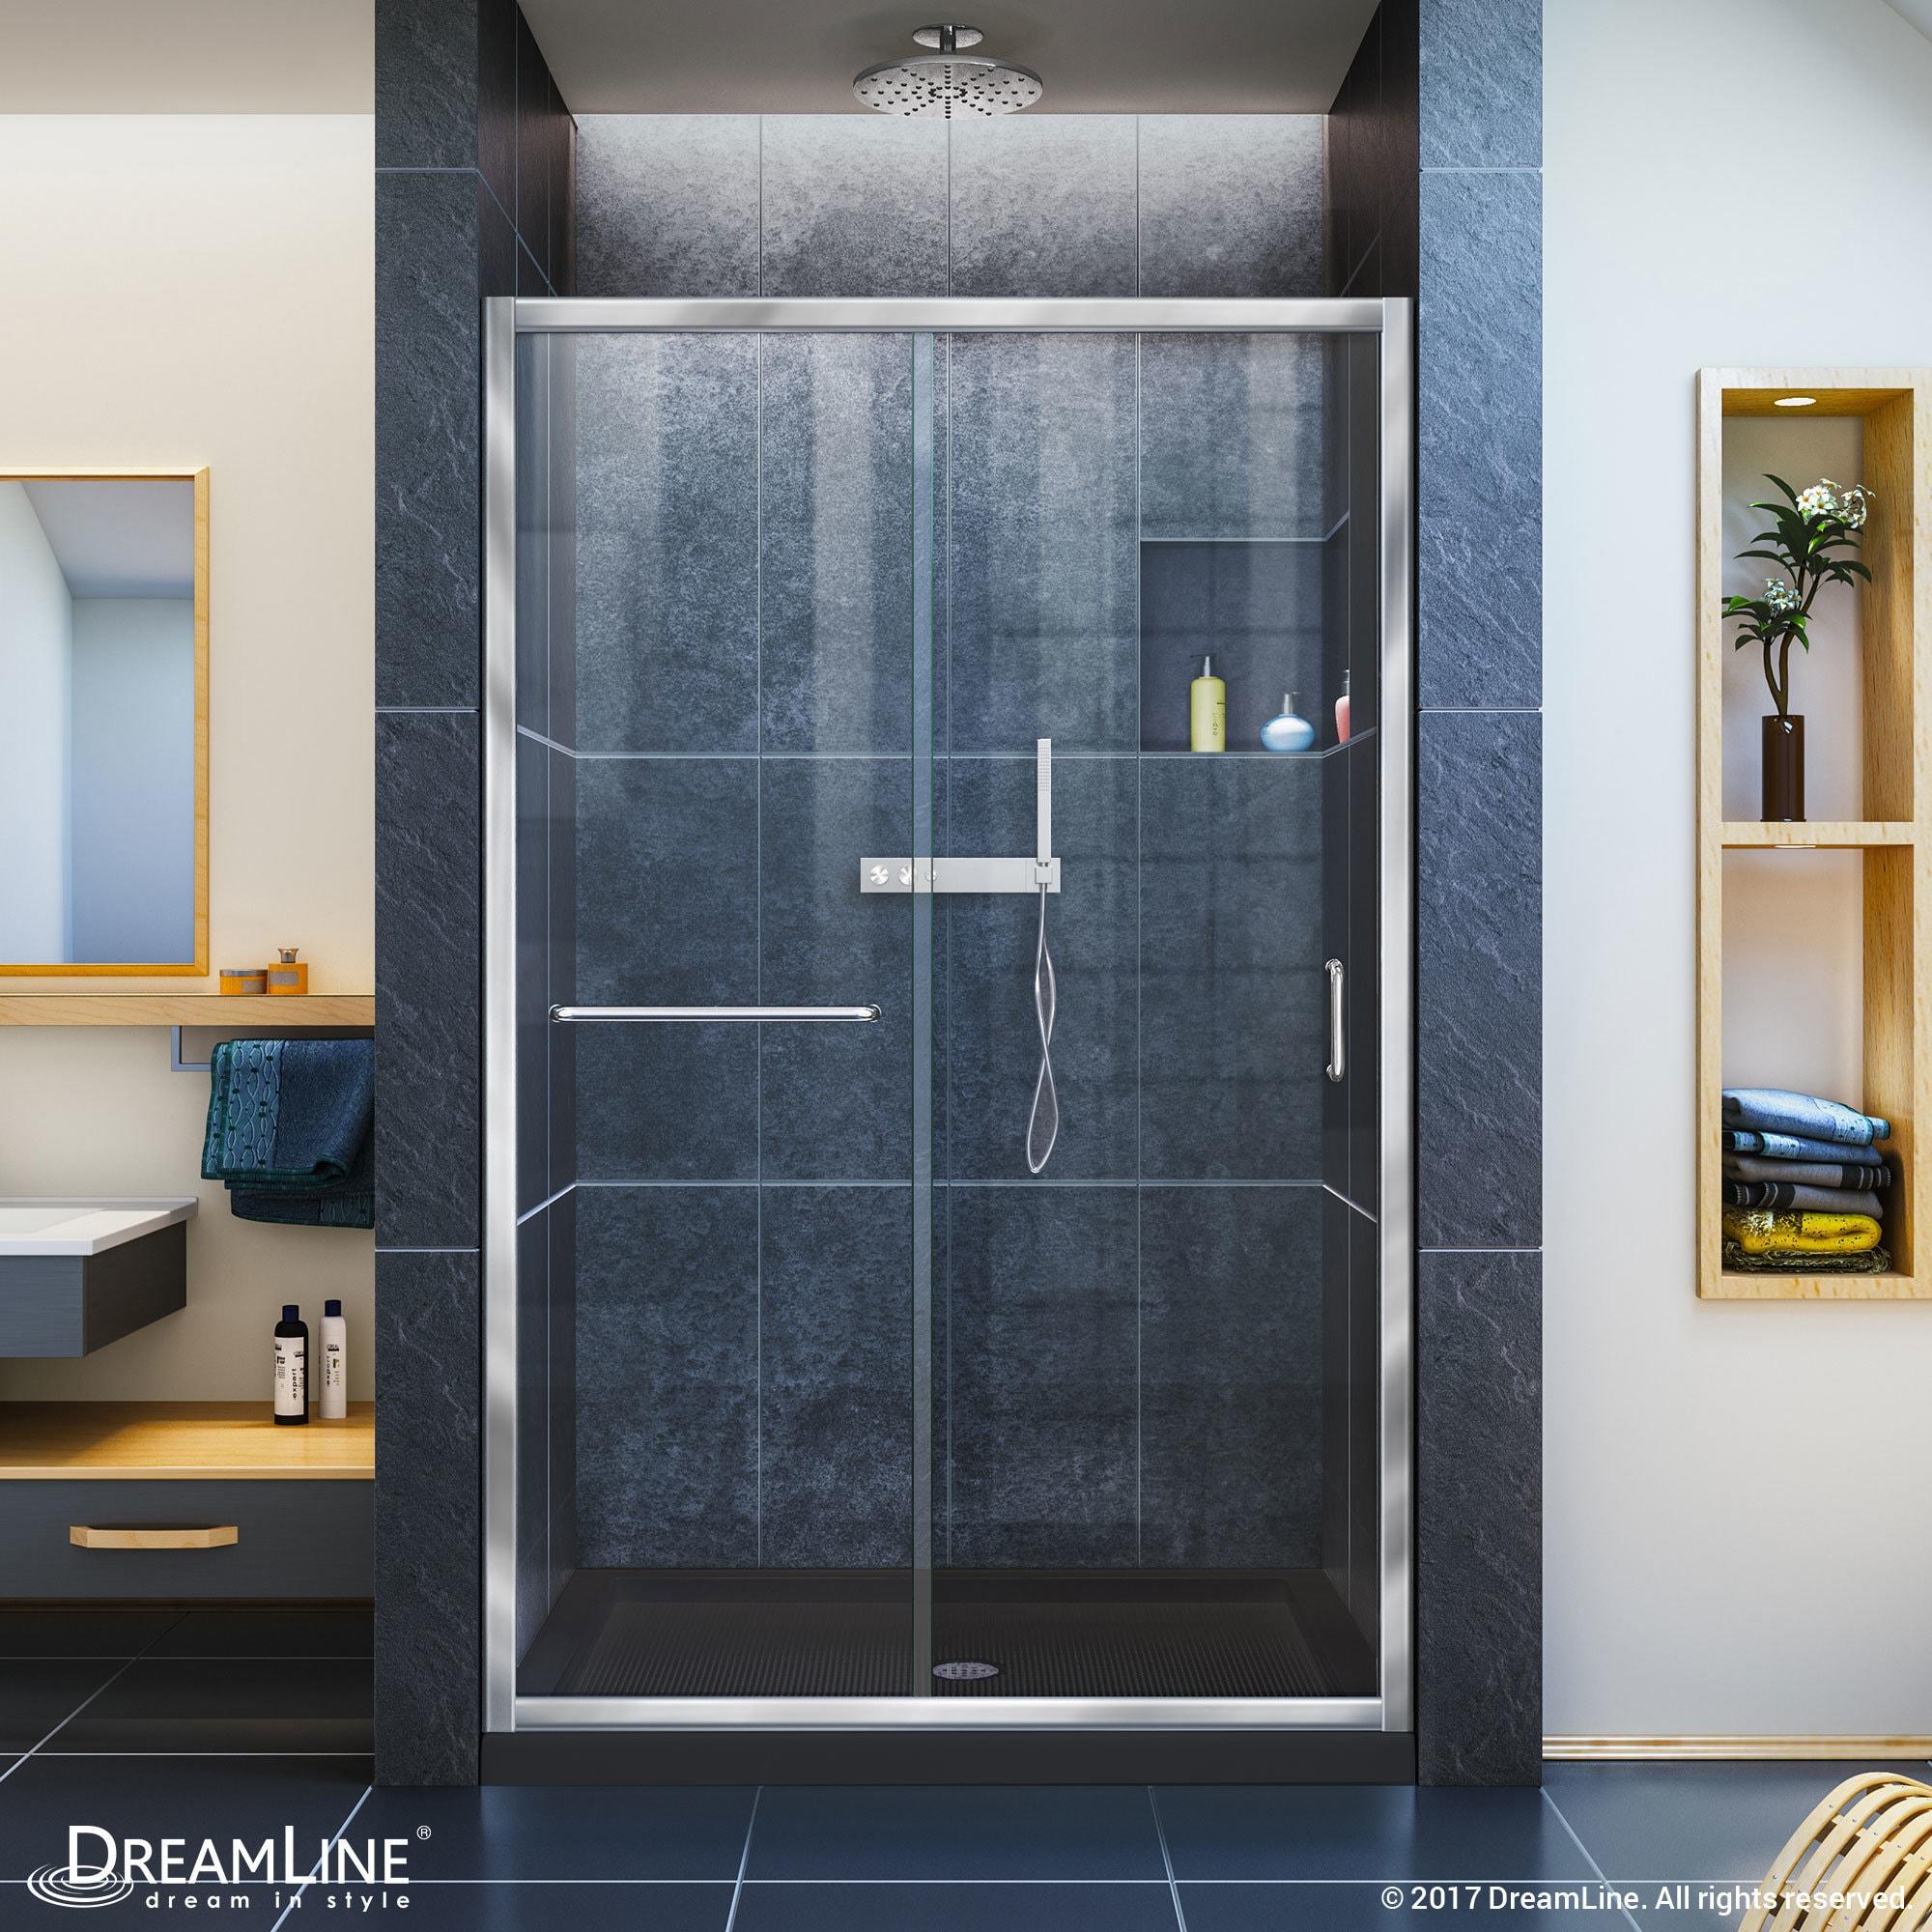 Dreamline Infinity Z 44 48 In W X 72 In H Semi Frameless Sliding Shower Door 44 48 W